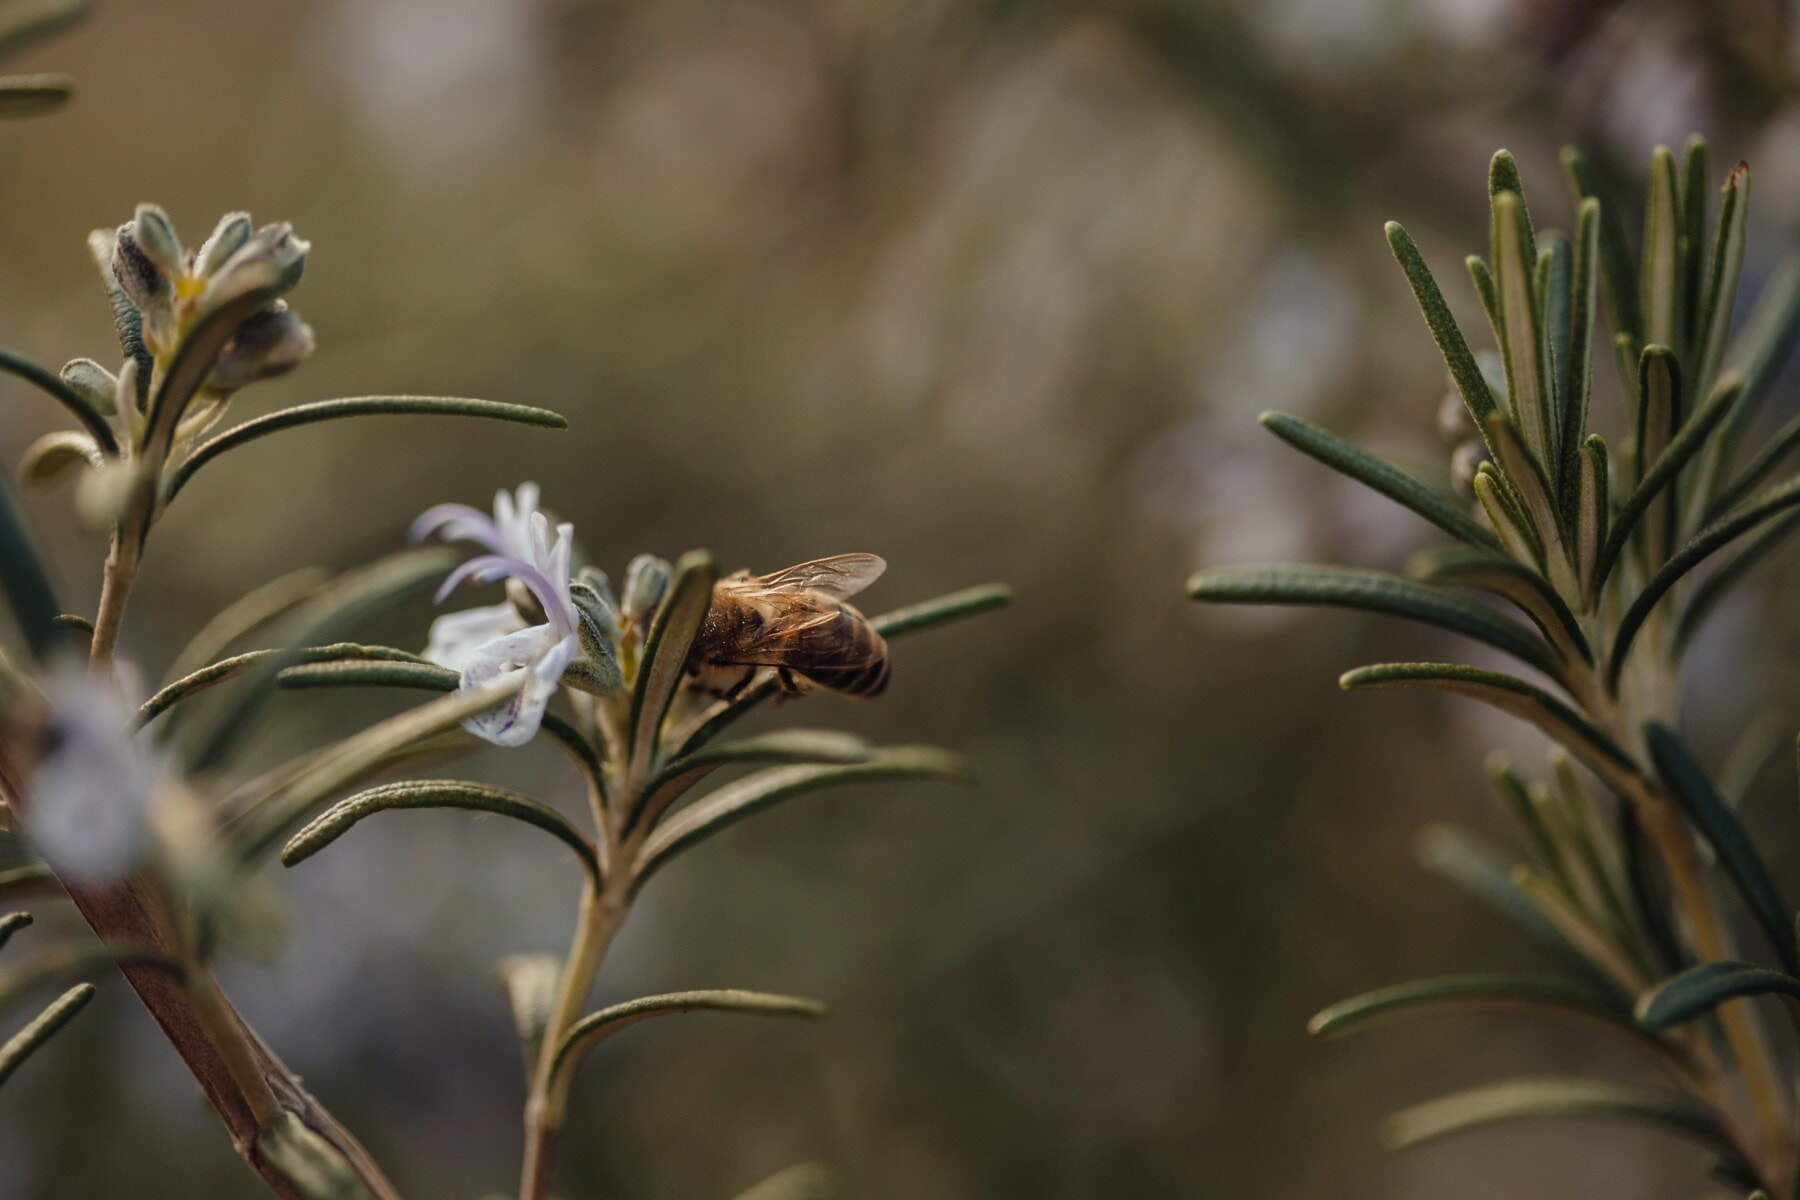 romarin, herbe, aromatique, abeille, pollen, plante, nature, arbre, Evergreen, fleur